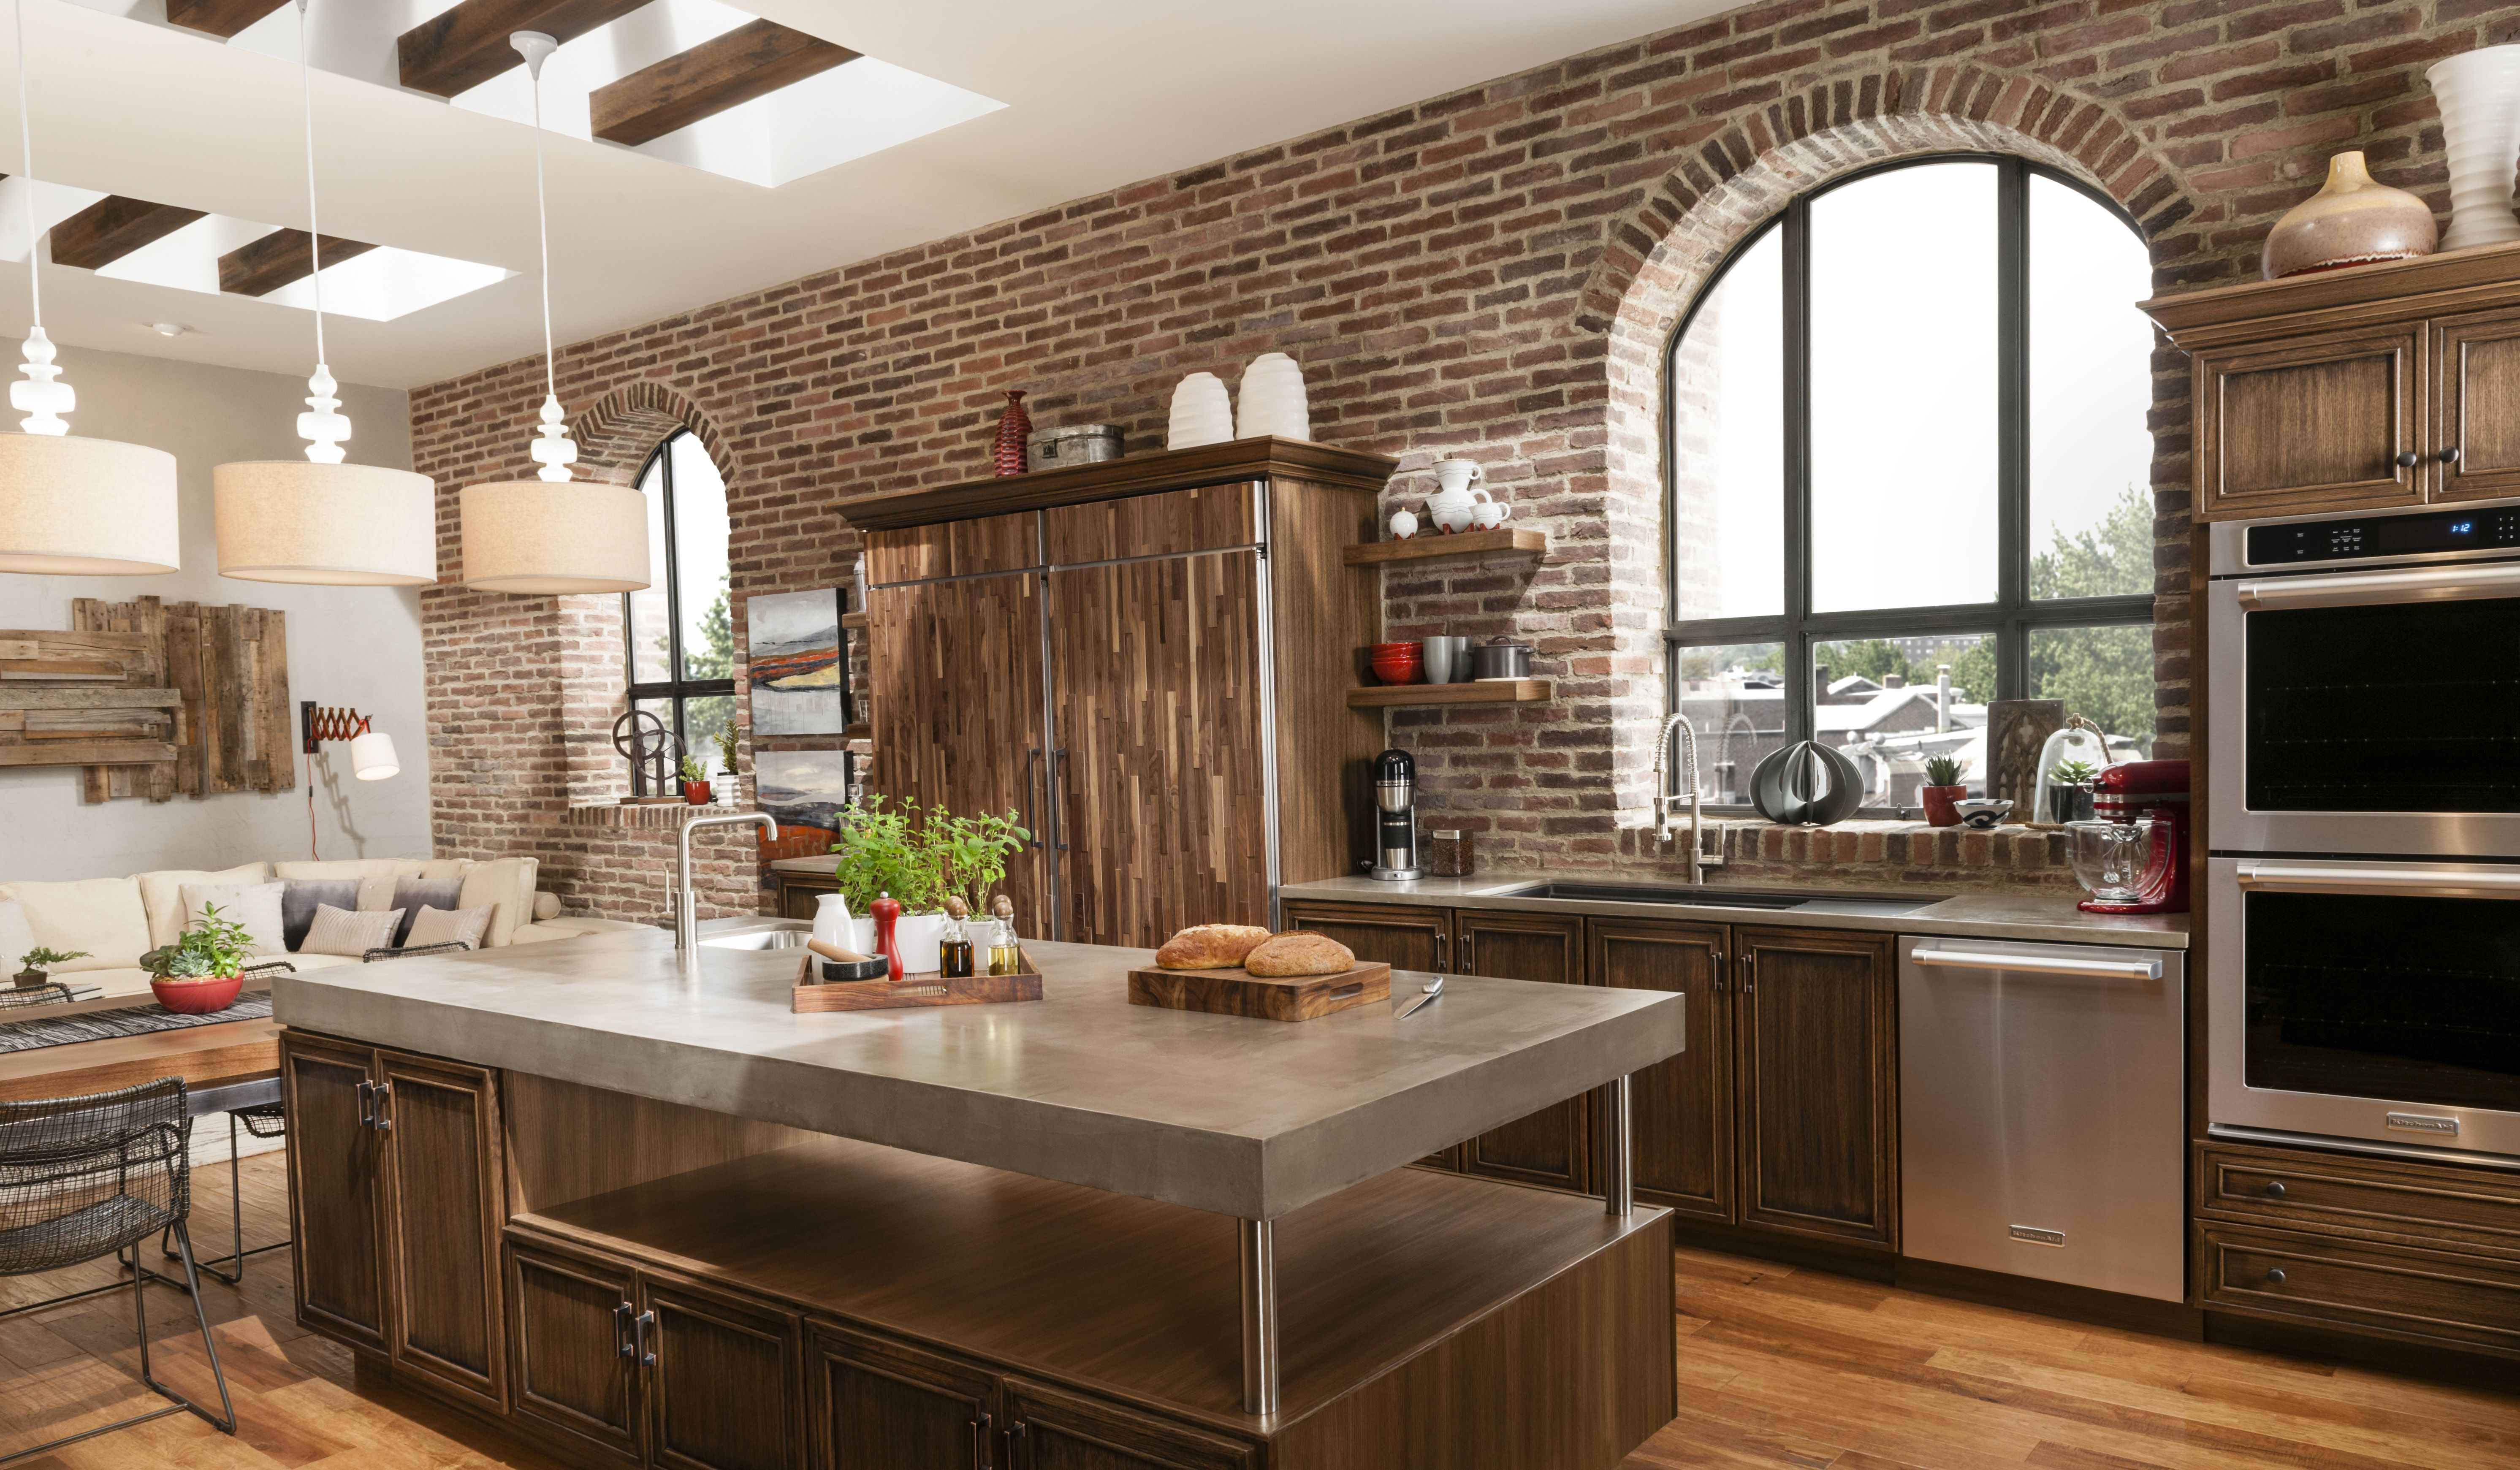 Eldorado Stone Romabrick Accent Wall With A Modern Kitchen